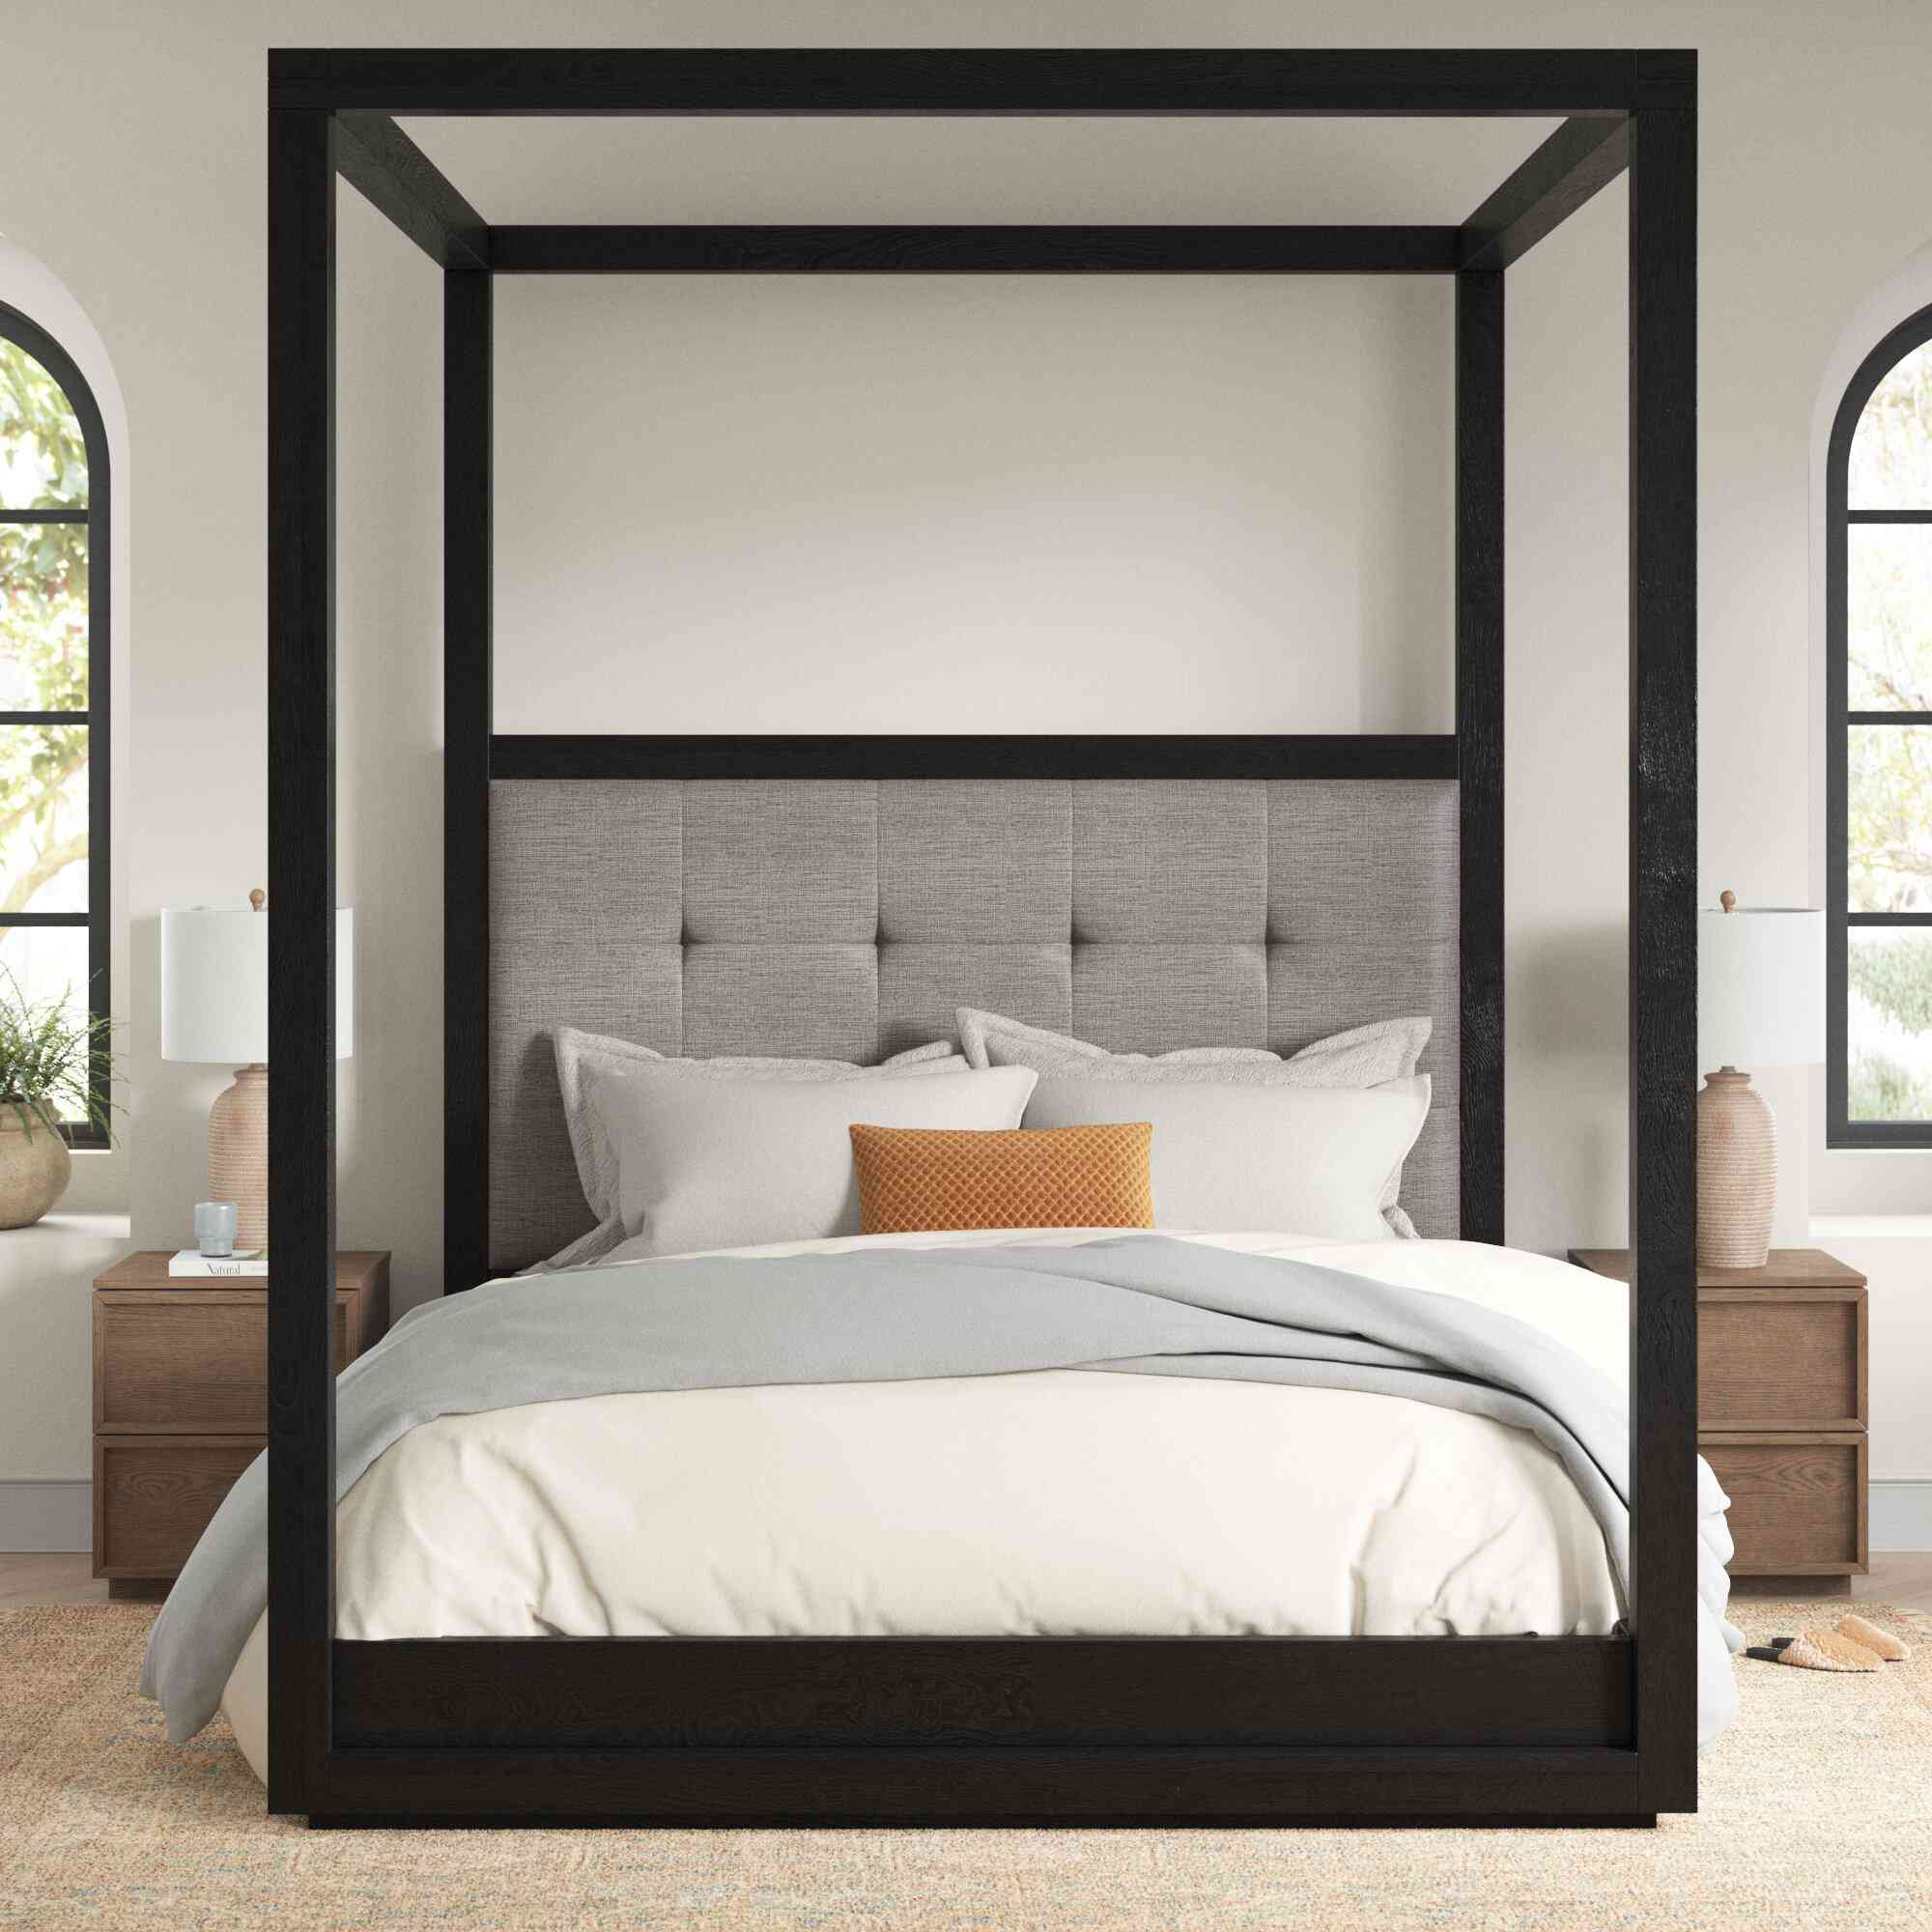 Joss & Main Paralimni Canopy Bed